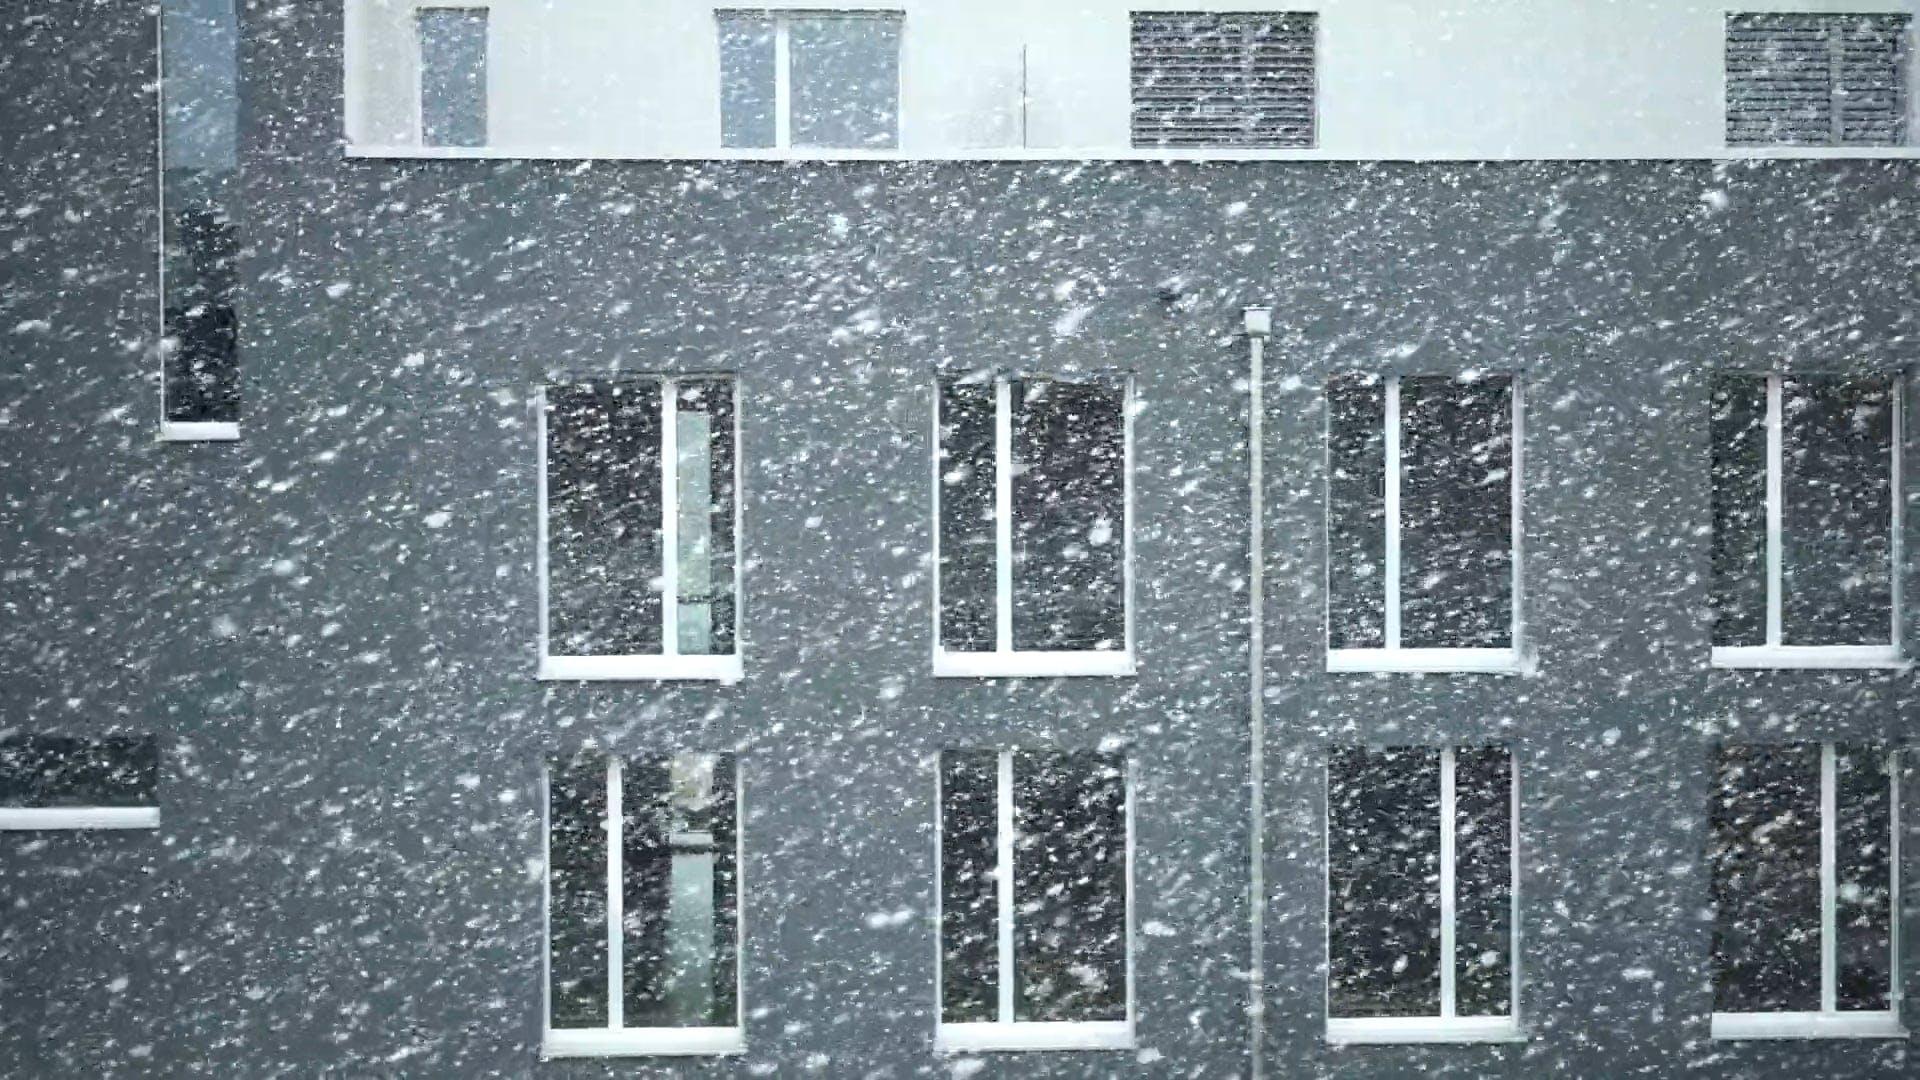 Winter Season In The City